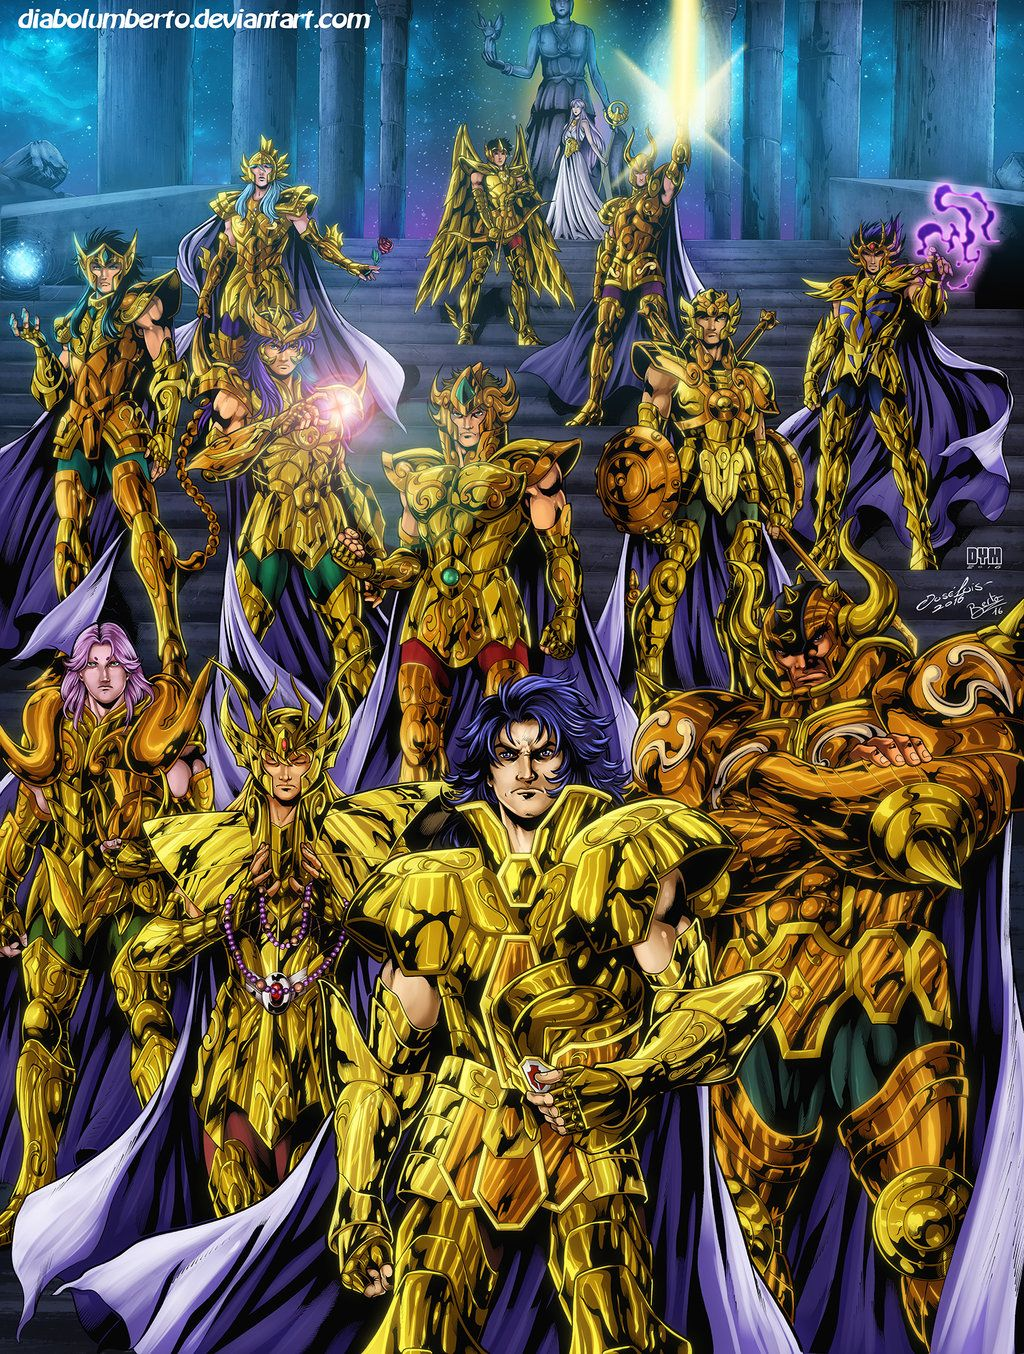 Saint Seiya Gold Saints By Diabolumberto Les Chevaliers Du